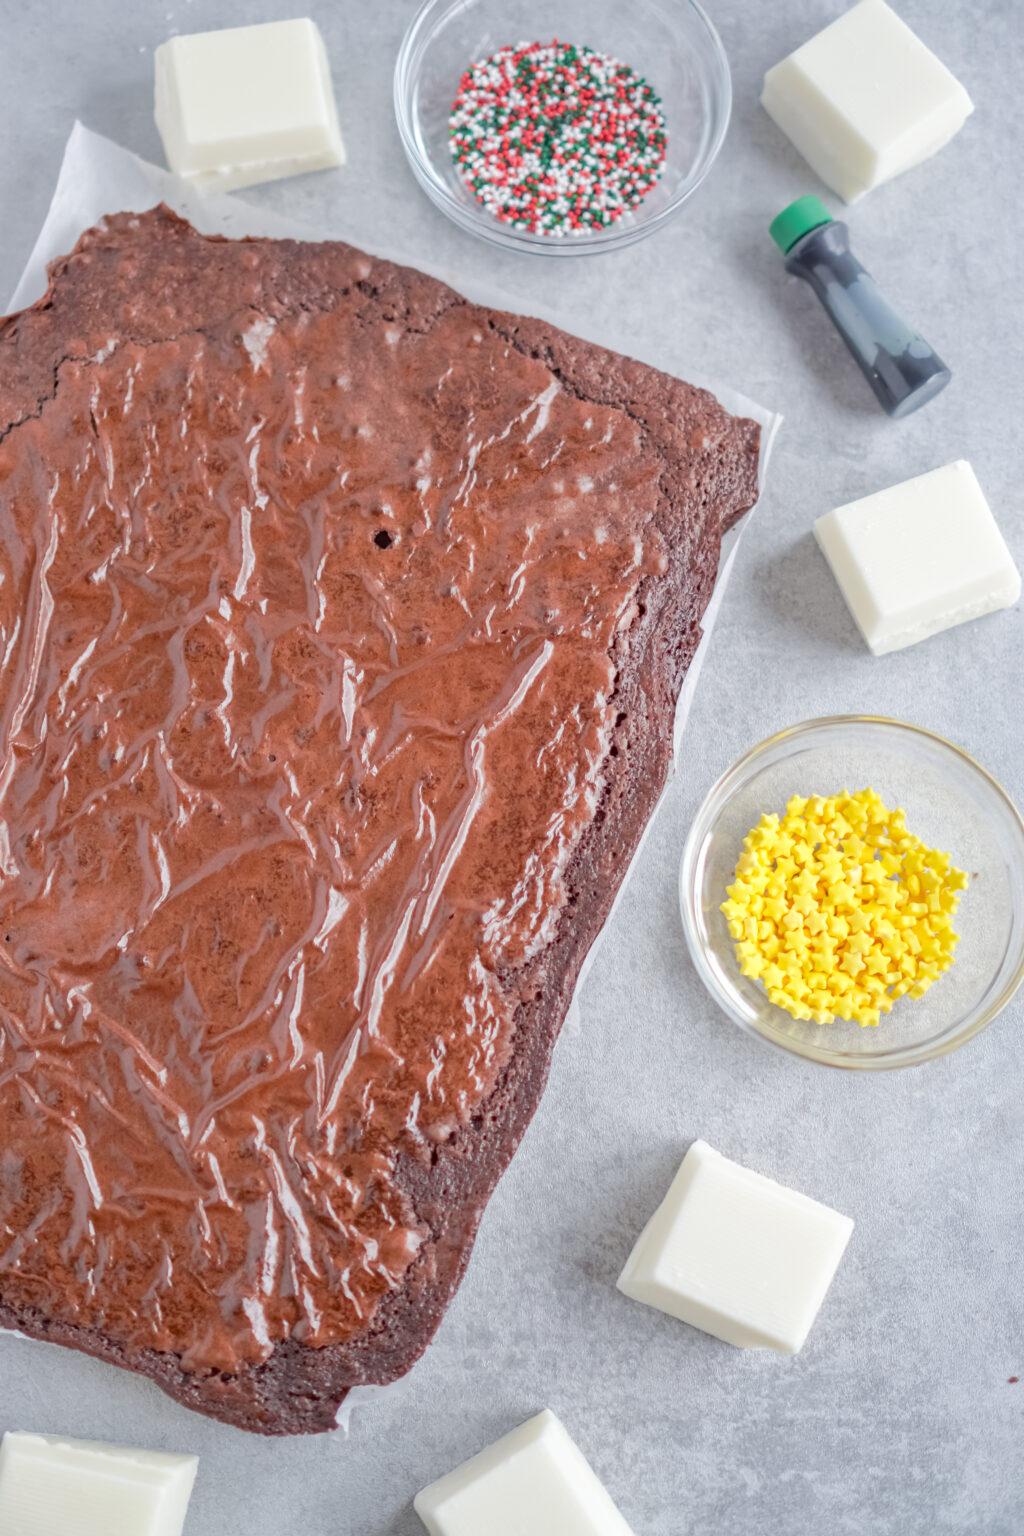 large brownie on table